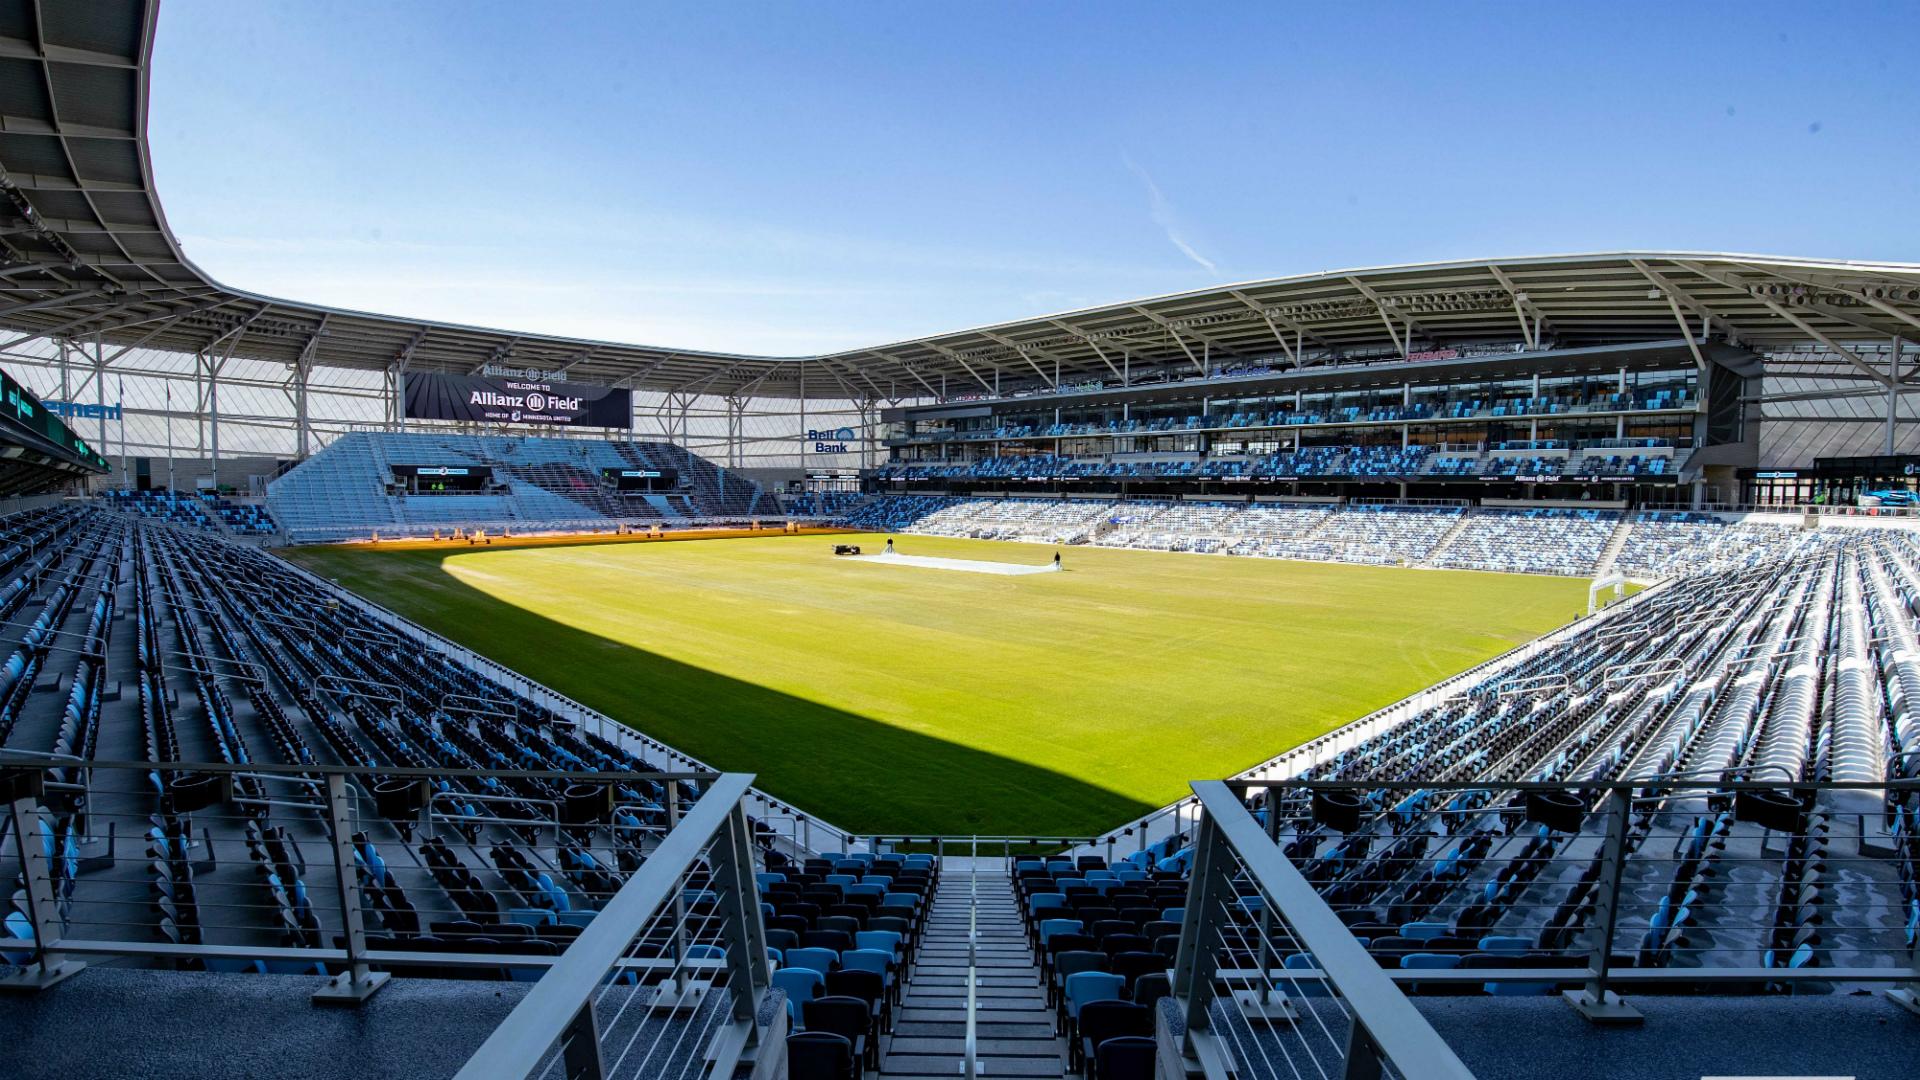 Allianz Field Daylight 04122019